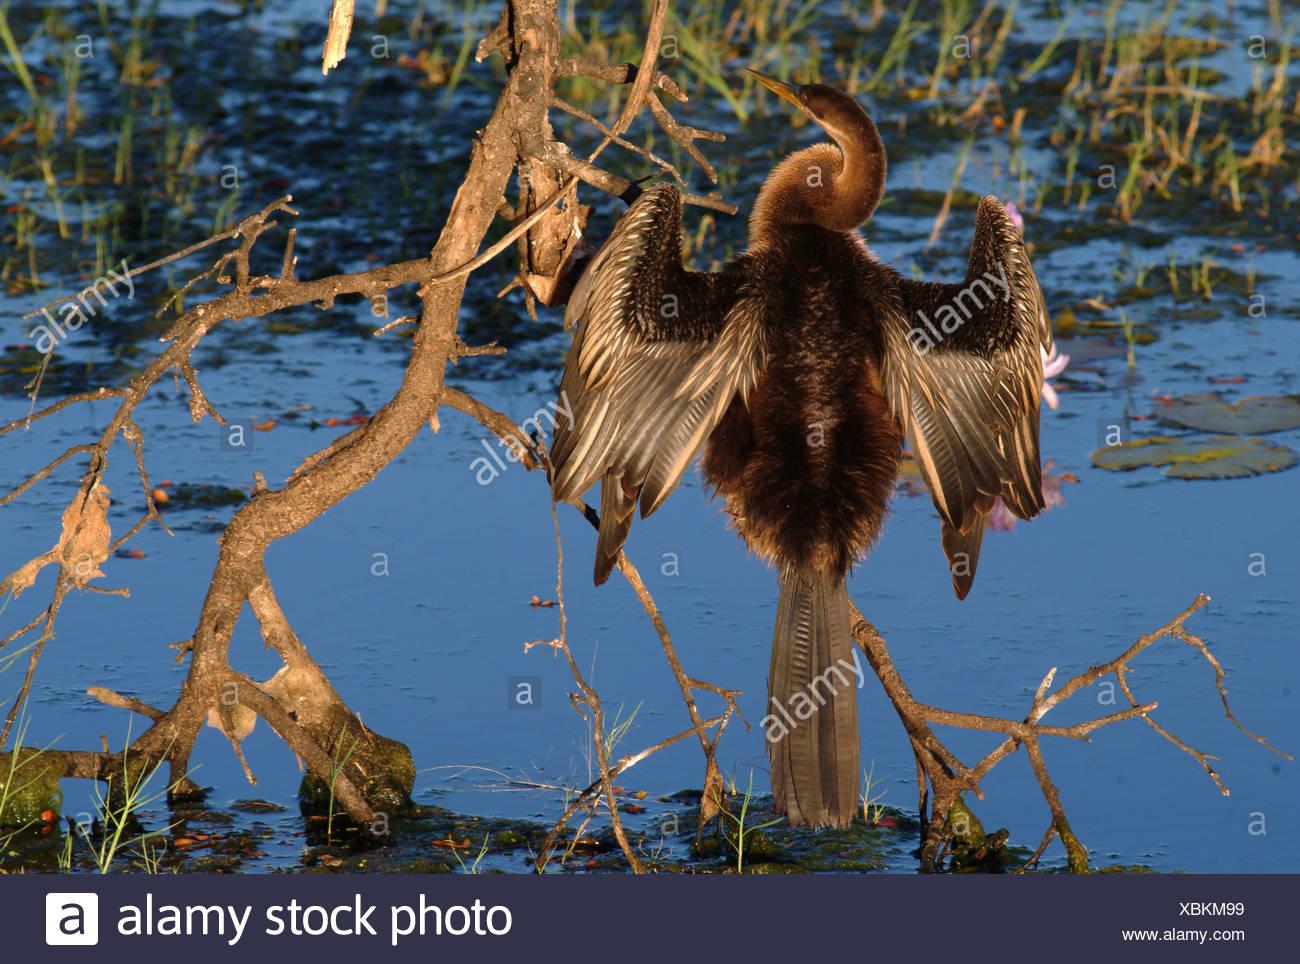 Australian Oriental Darter (Anhinga melanogasternovaehollandiae), Kakadu national park, Australia - Stock Image